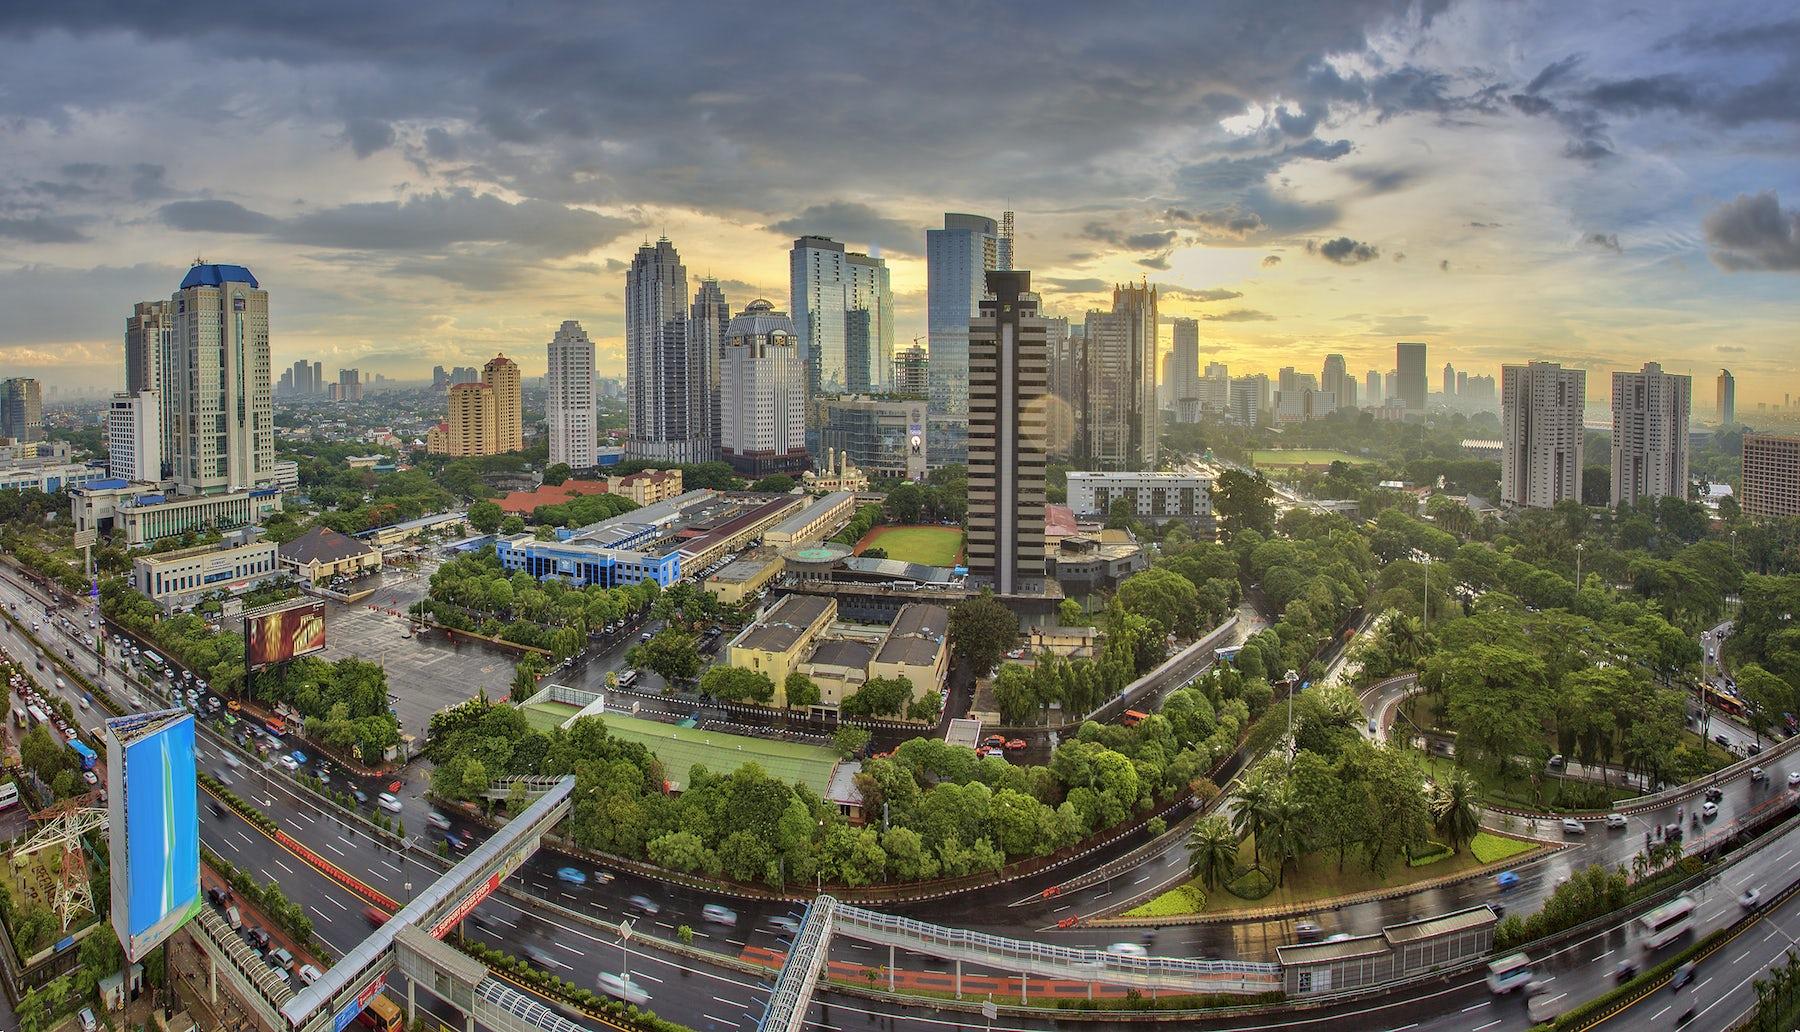 Jakarta City, Indonesia | Source: Shutterstock